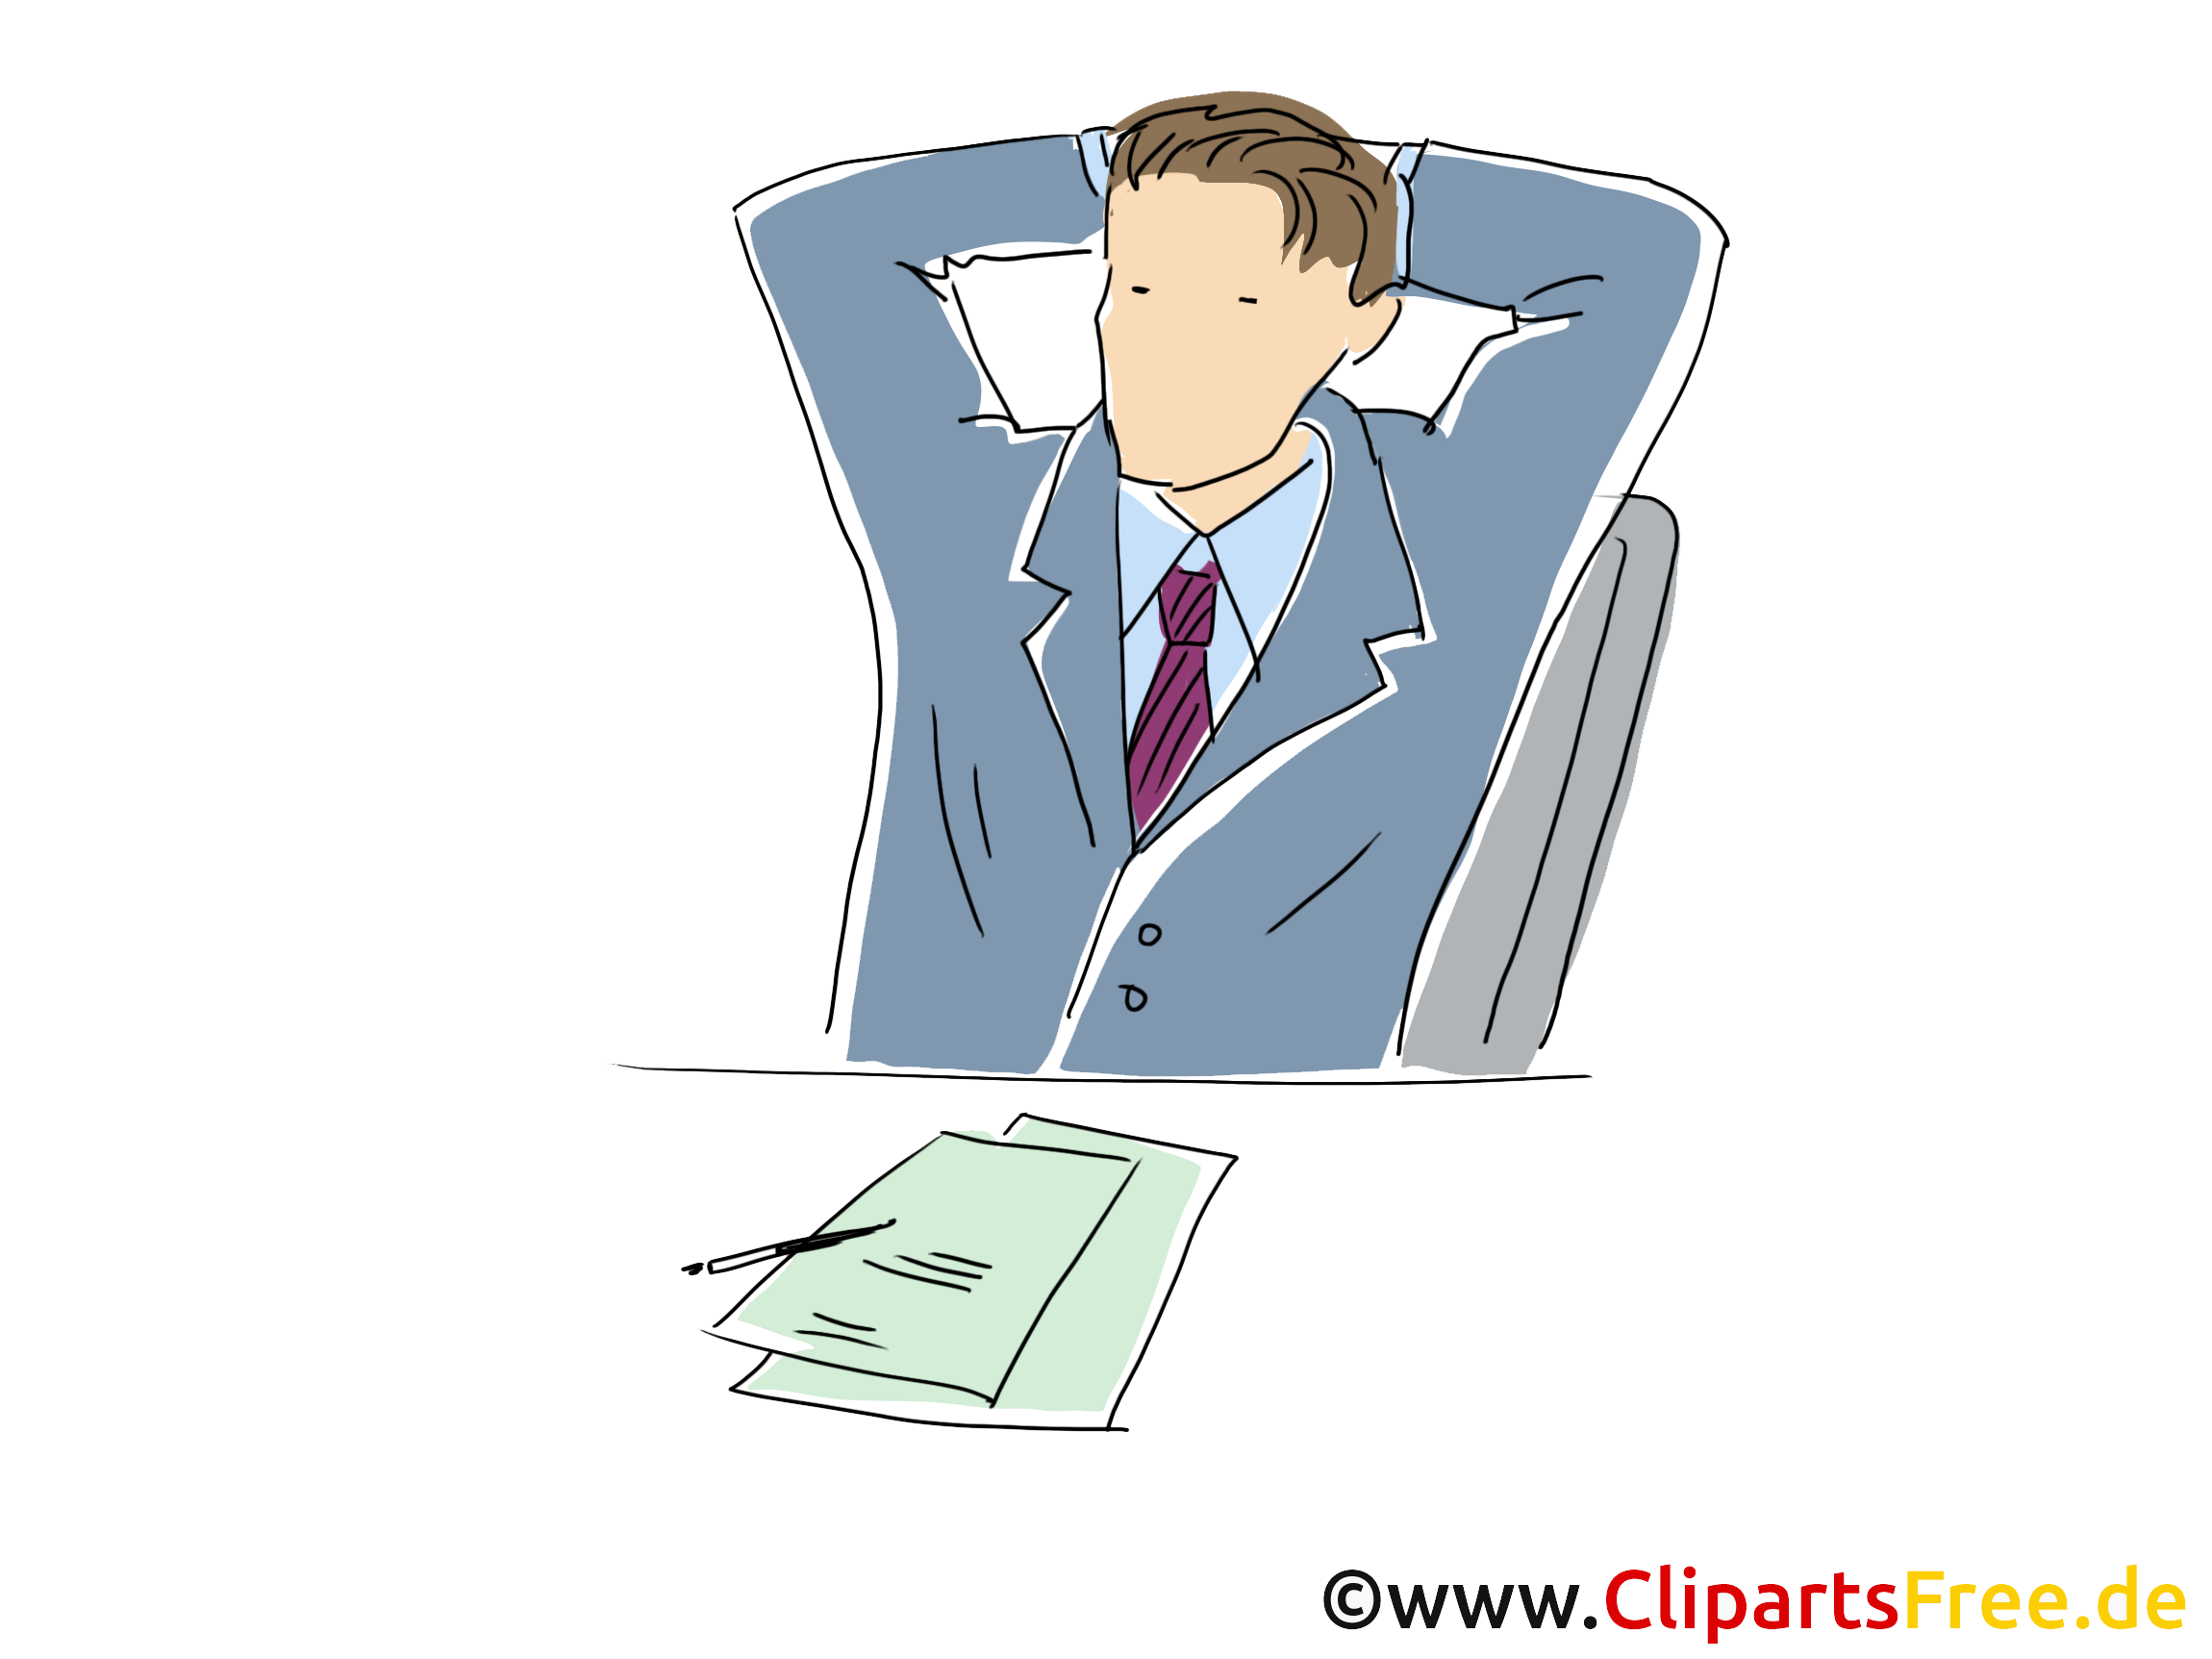 Entspannung am Arbeitsplatz Clipart, Grafik, Bild